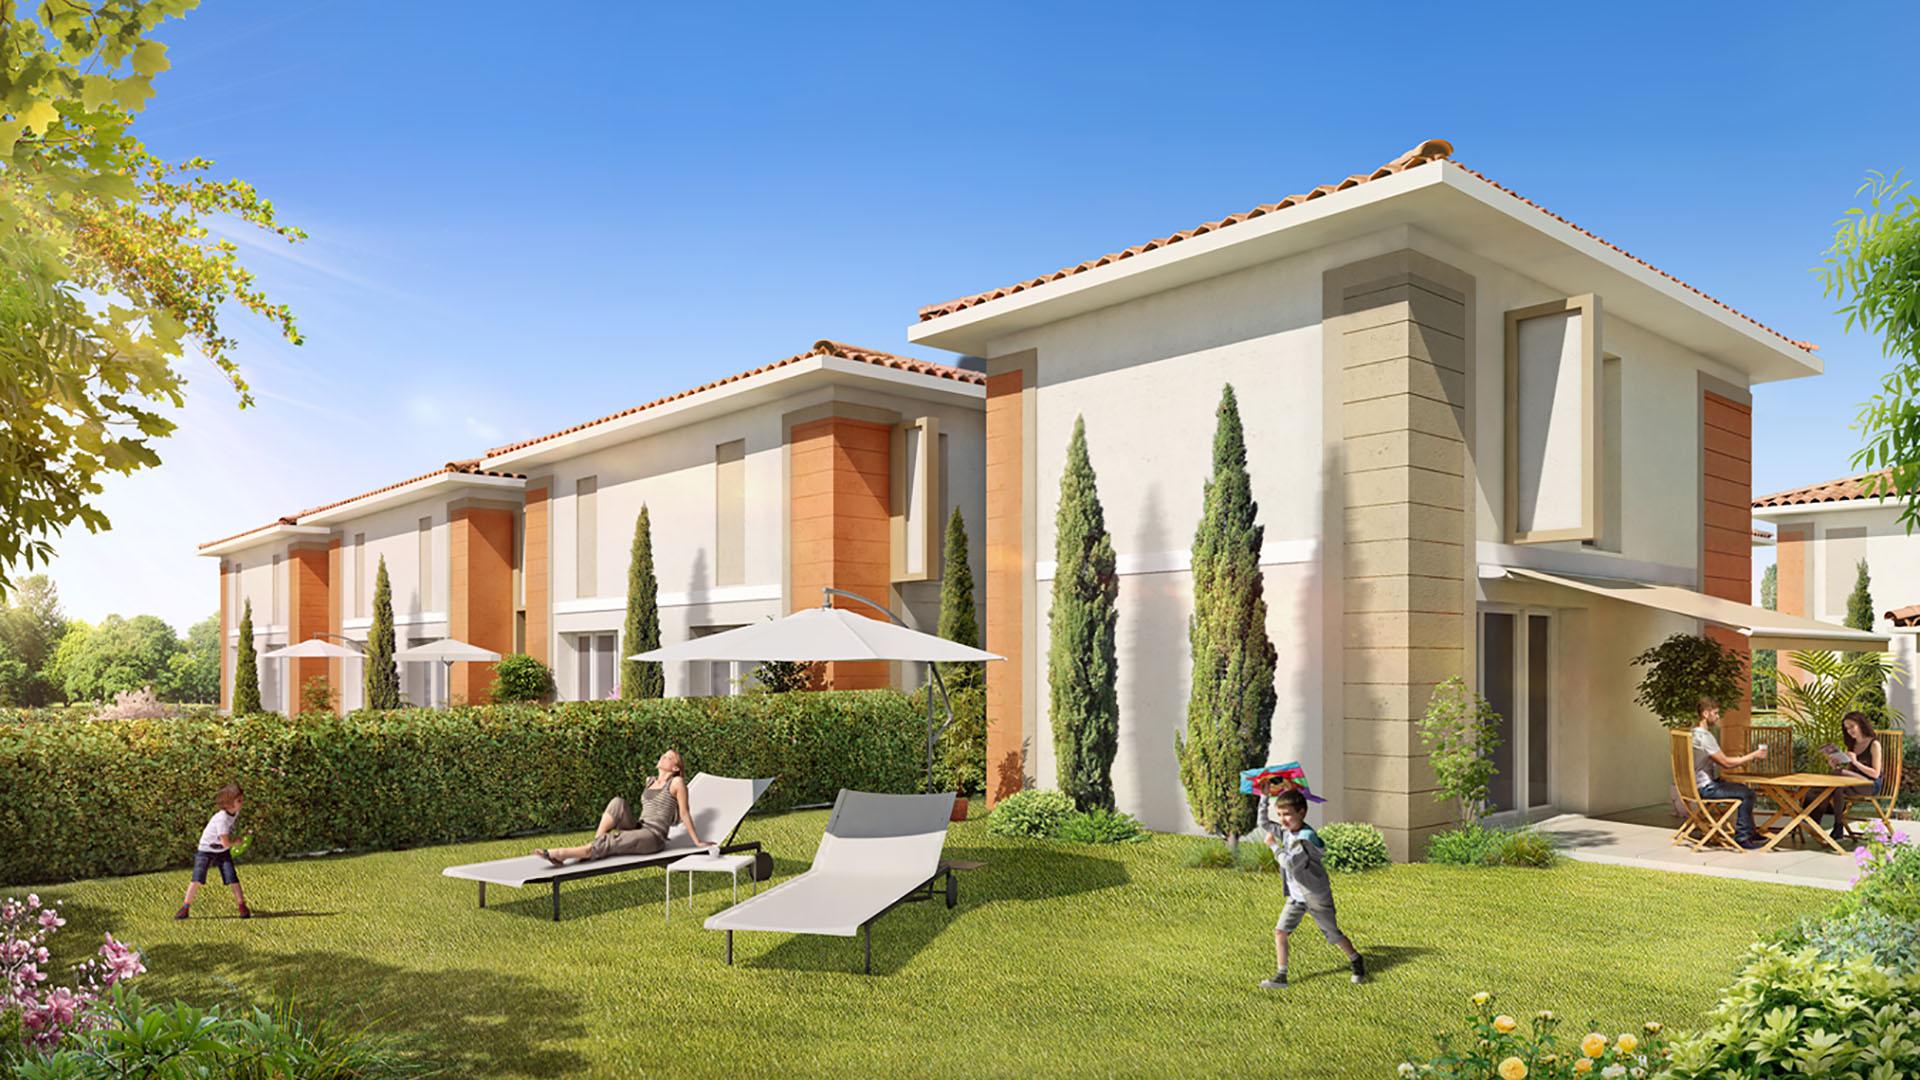 Le clos leyran programme immobilier neuf villenave d 39 ornon for Piscine clos d or grenoble